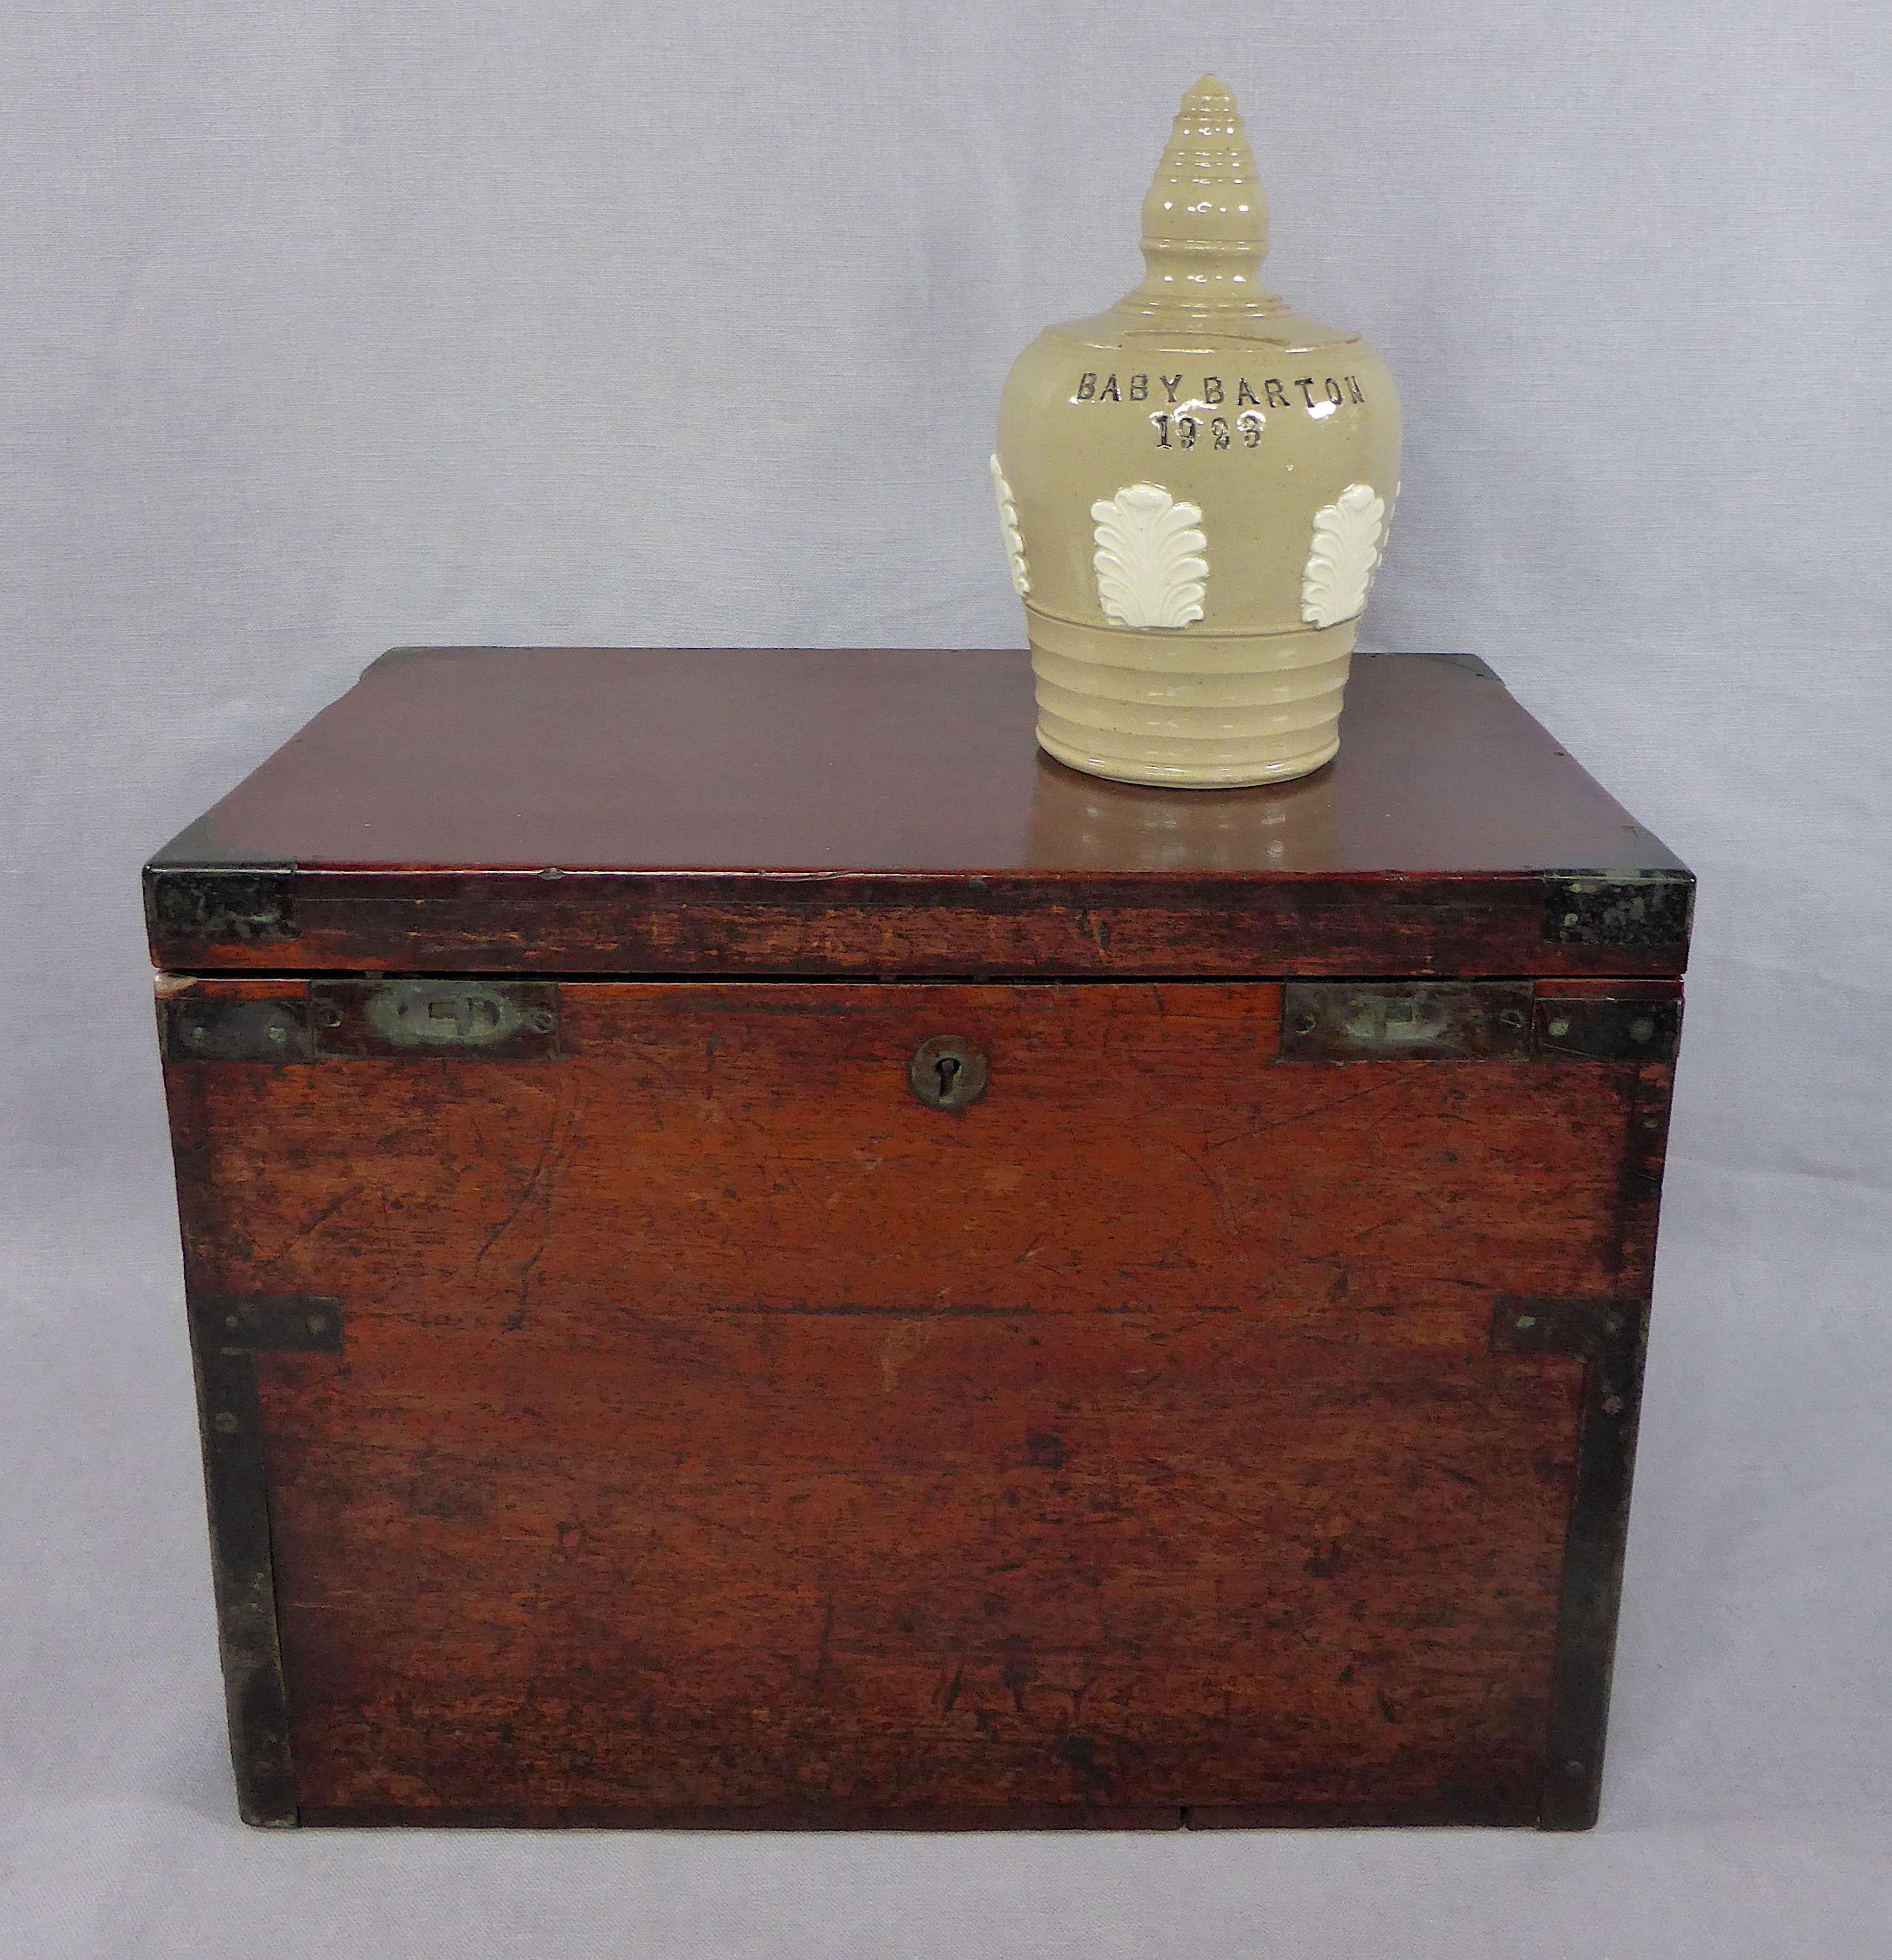 Baby Barton's Money Box